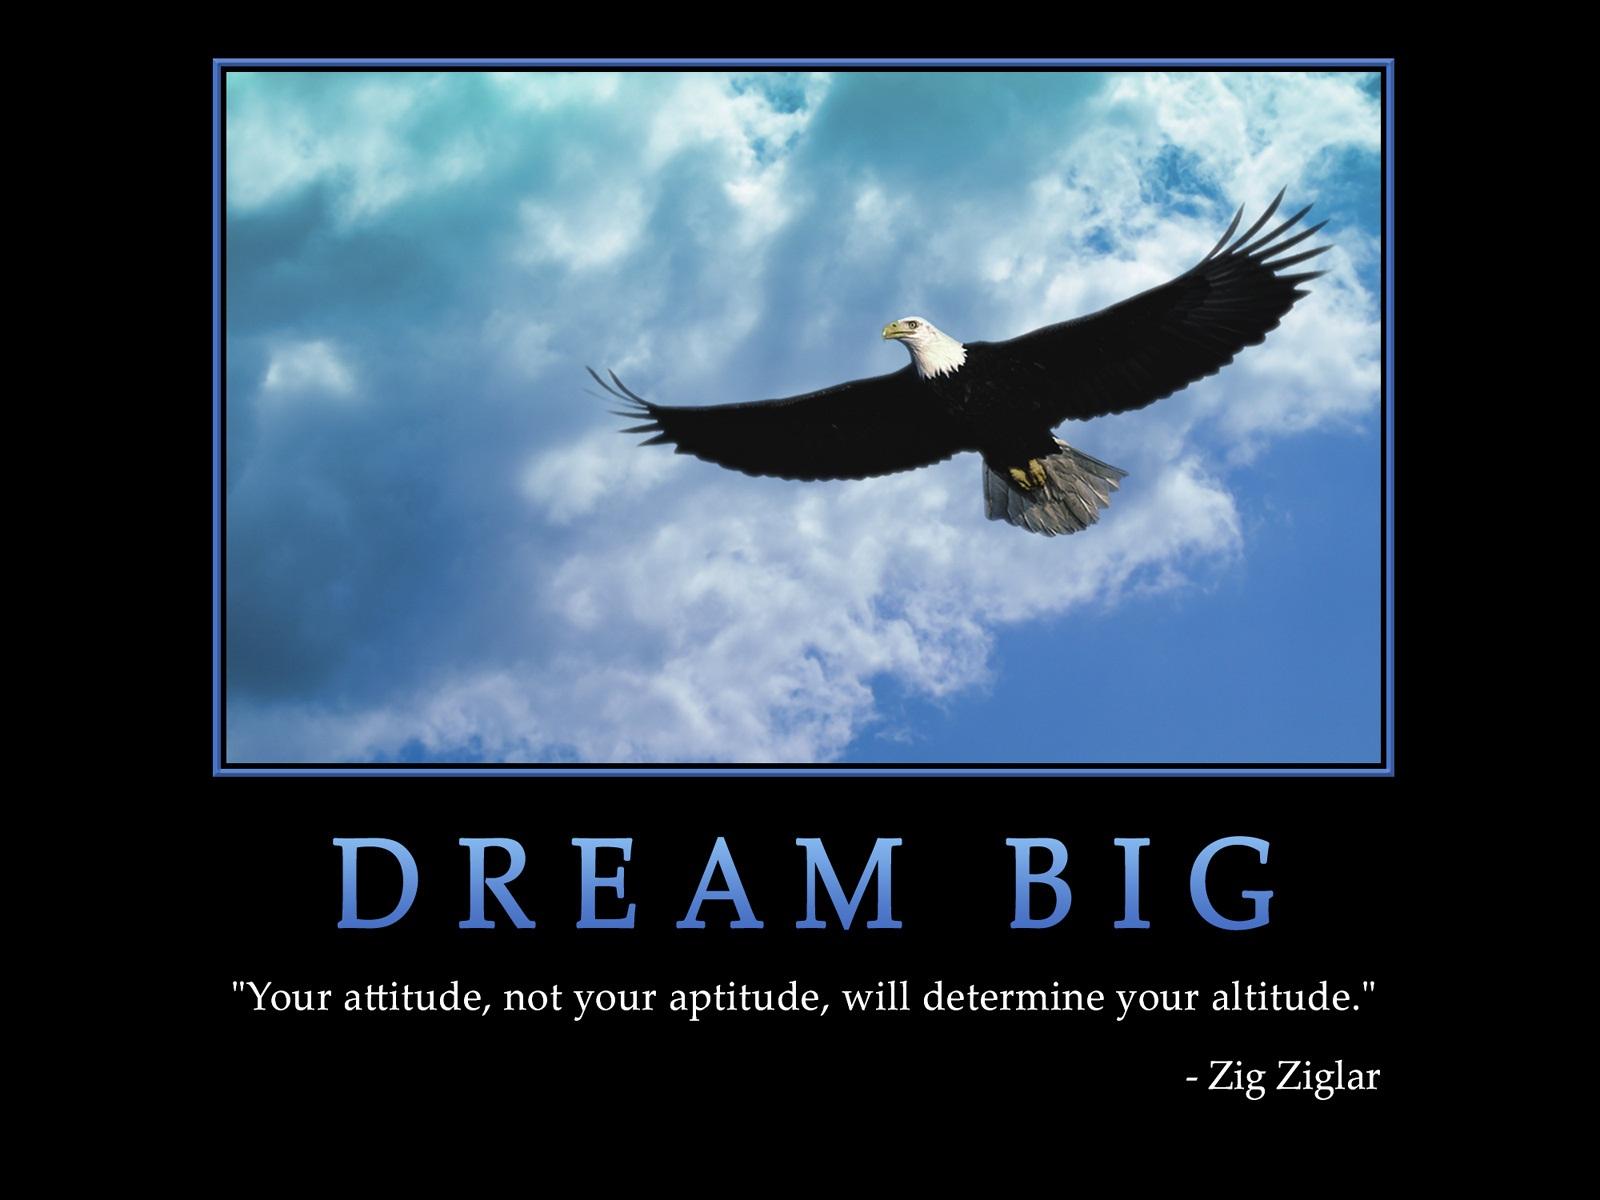 Your attitude, not your aptitude, will determine your altitude (Zig Zigler).